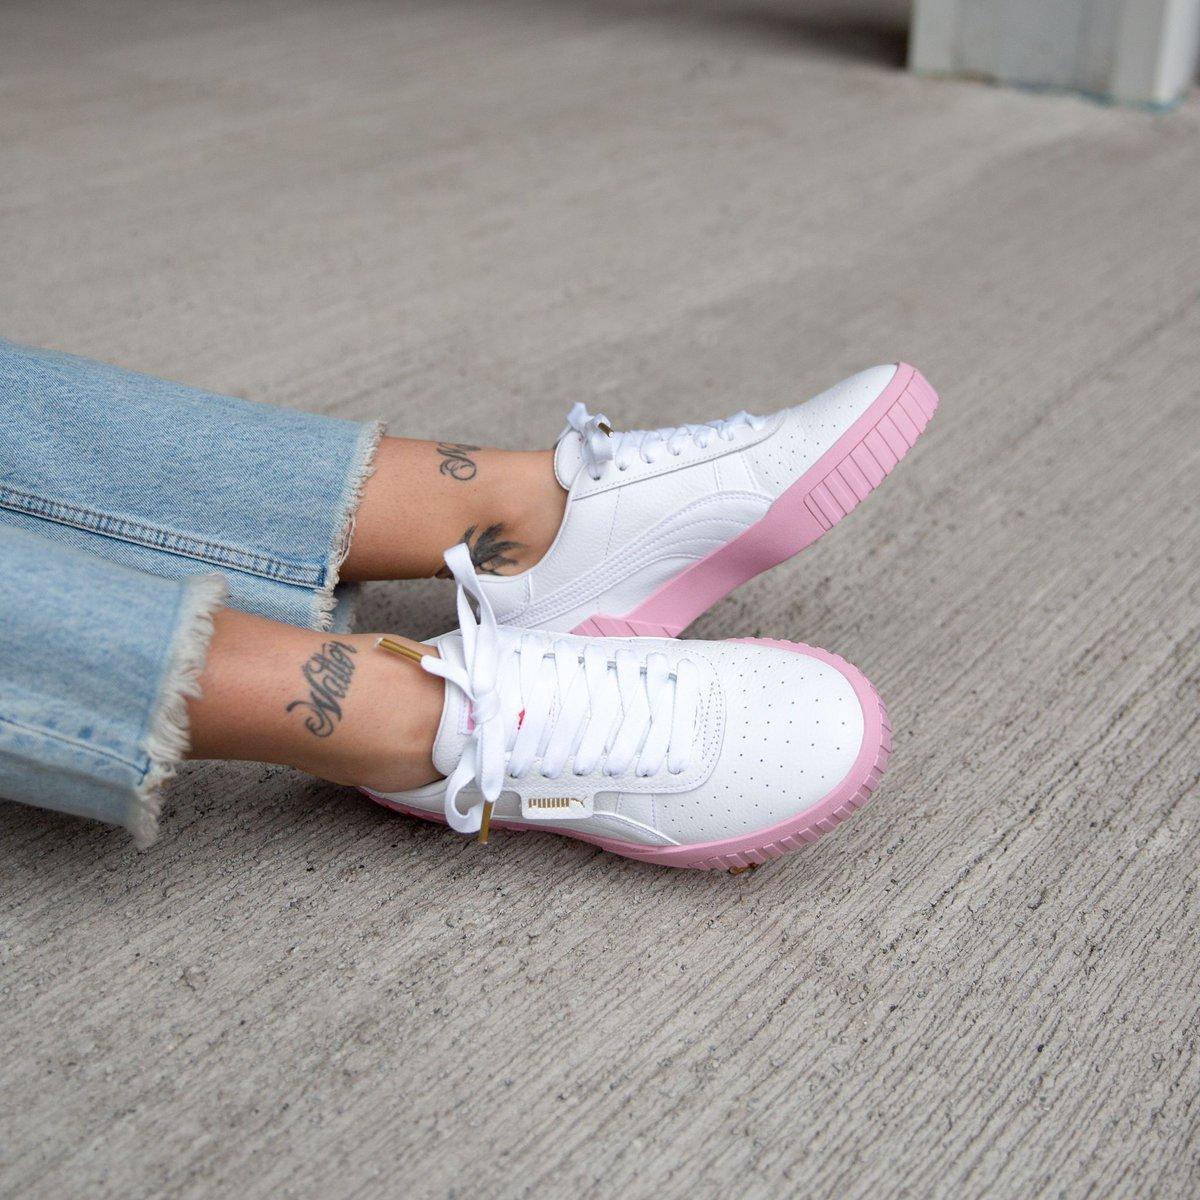 Puma White-Pale Pink click here